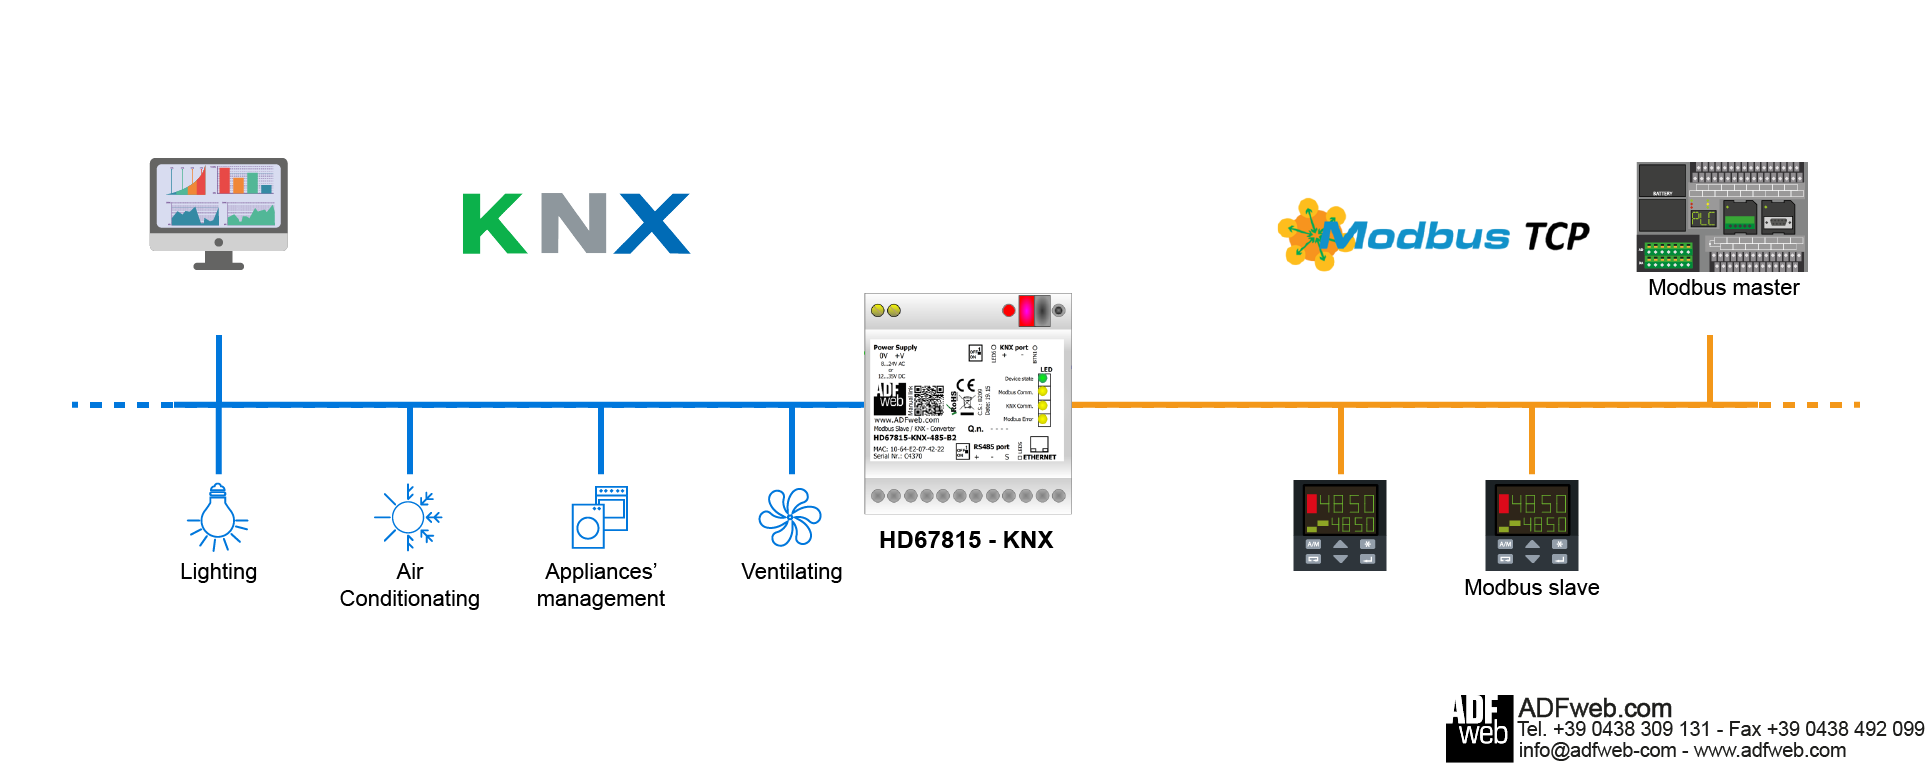 Gateway / Bridge Modbus TCP / KNX